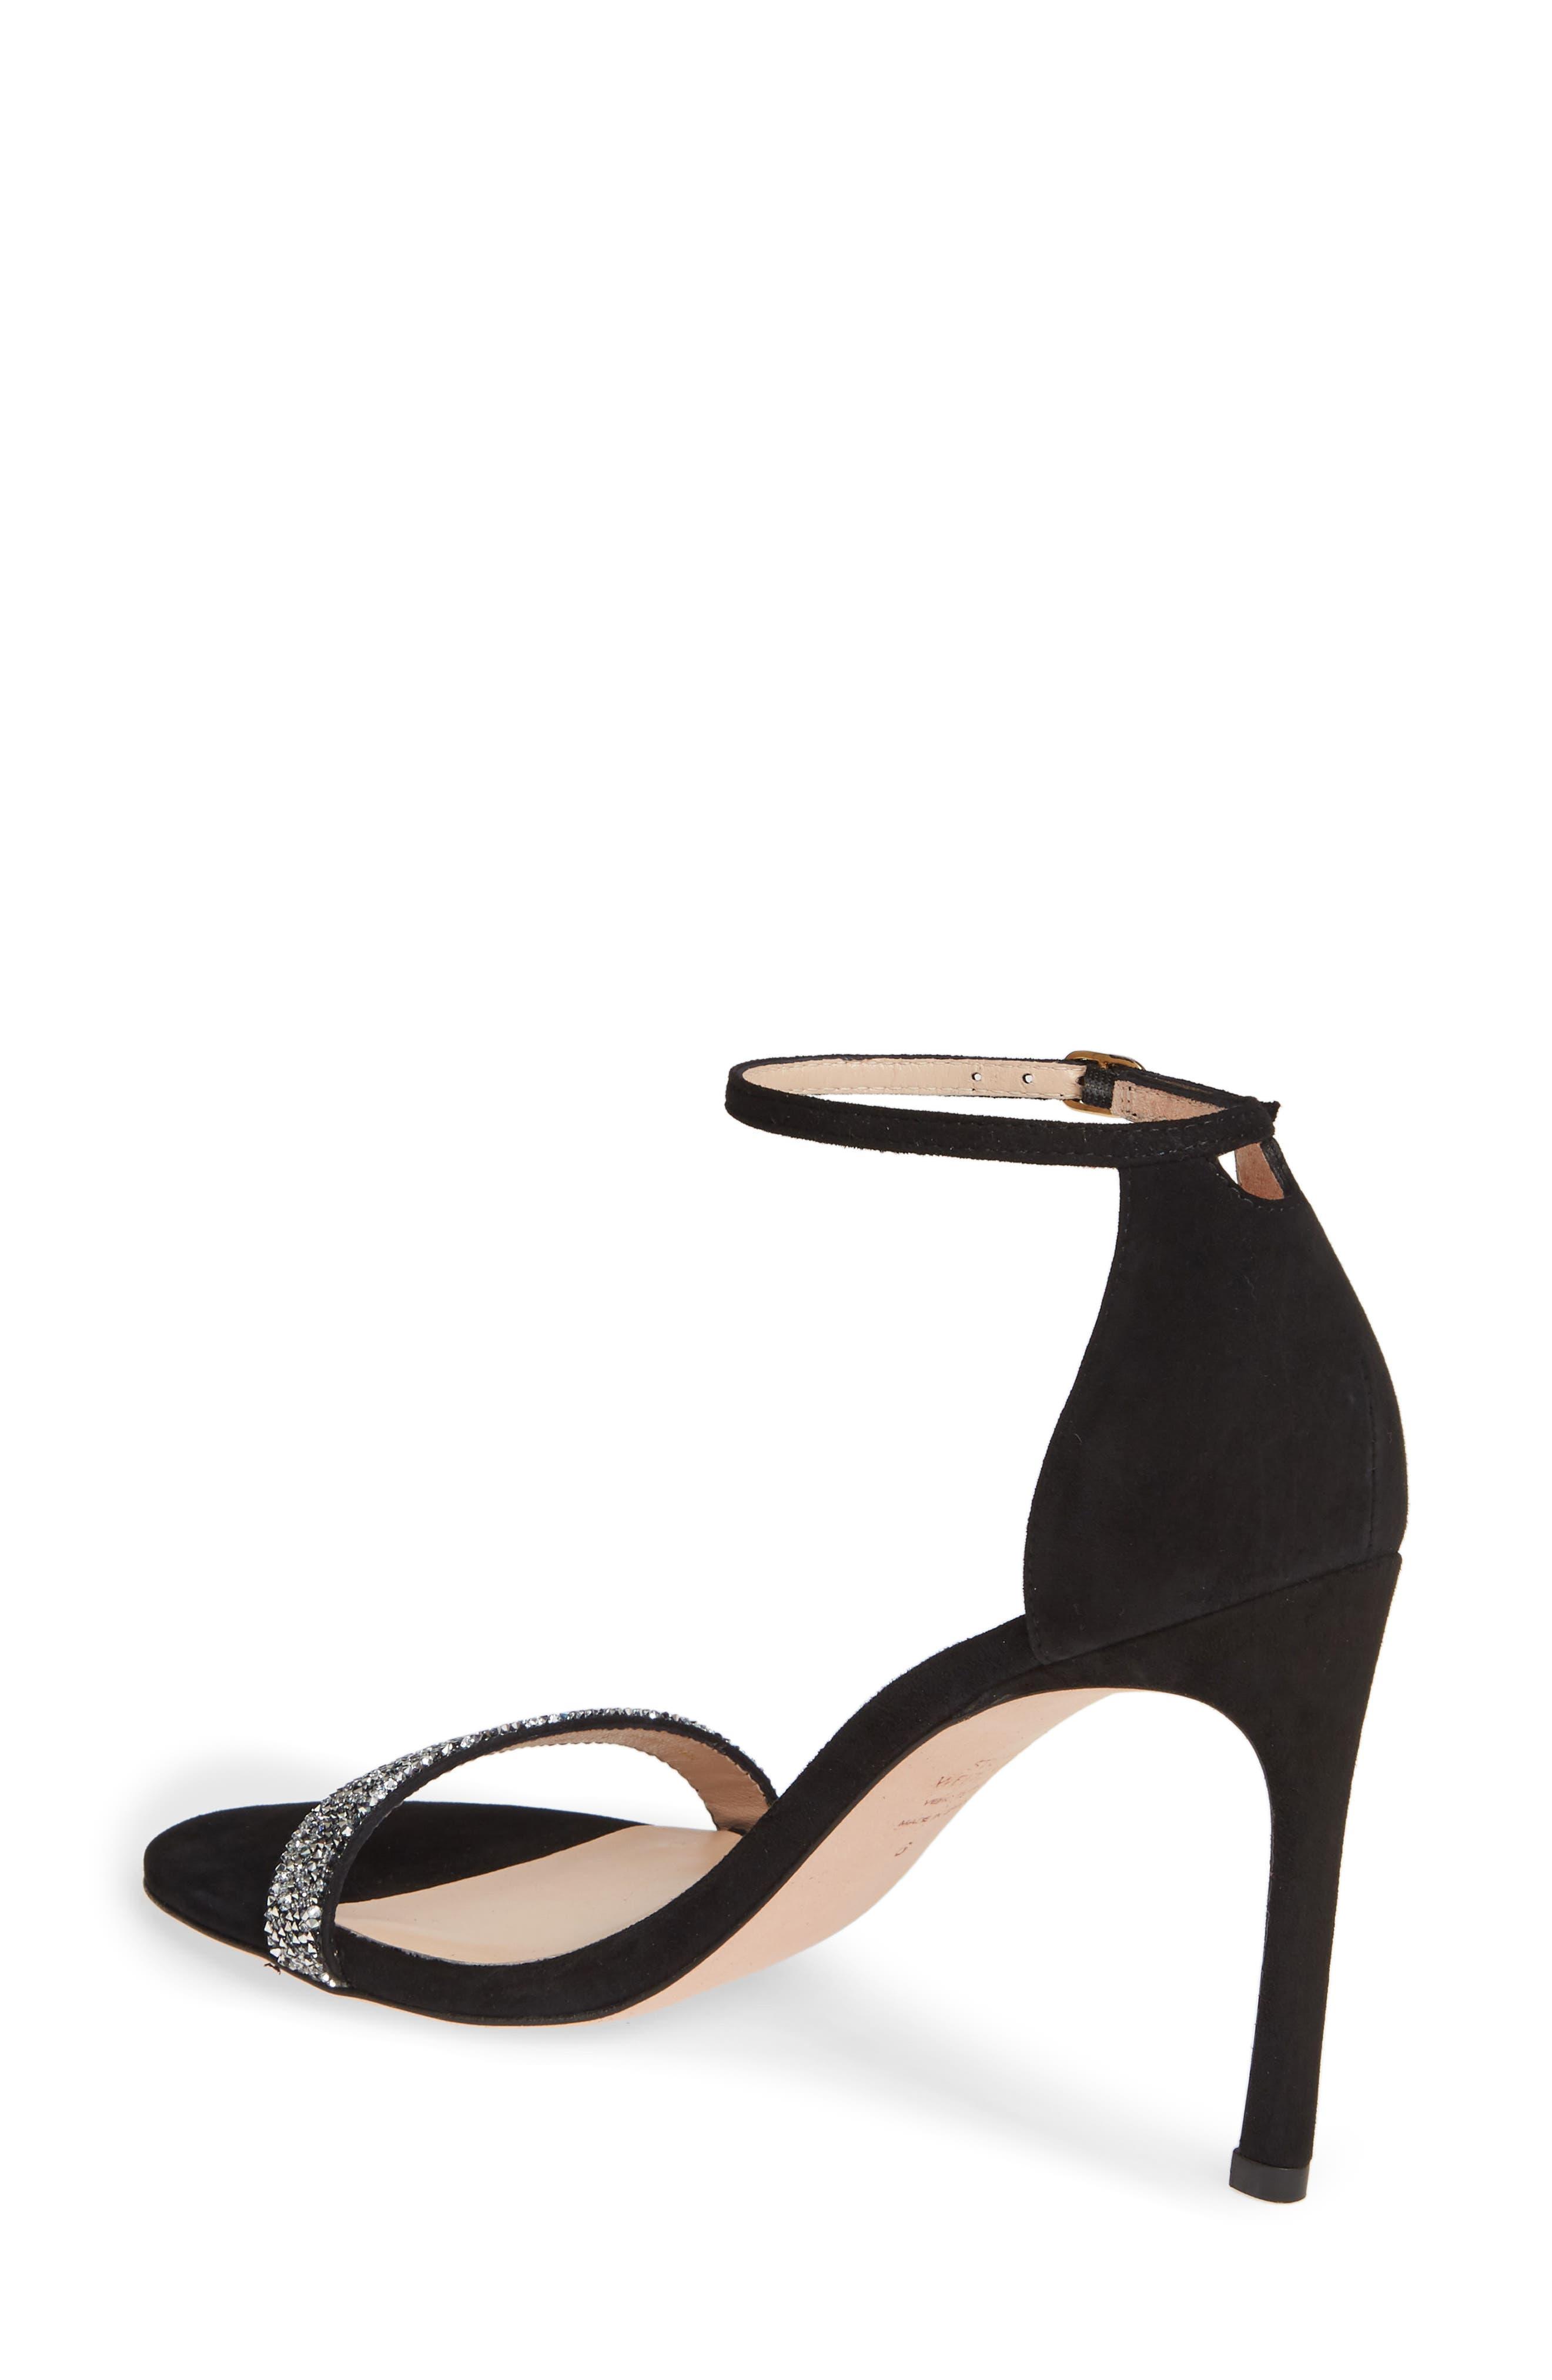 STUART WEITZMAN,                             Nudistsong Ankle Strap Sandal,                             Alternate thumbnail 2, color,                             BLACK